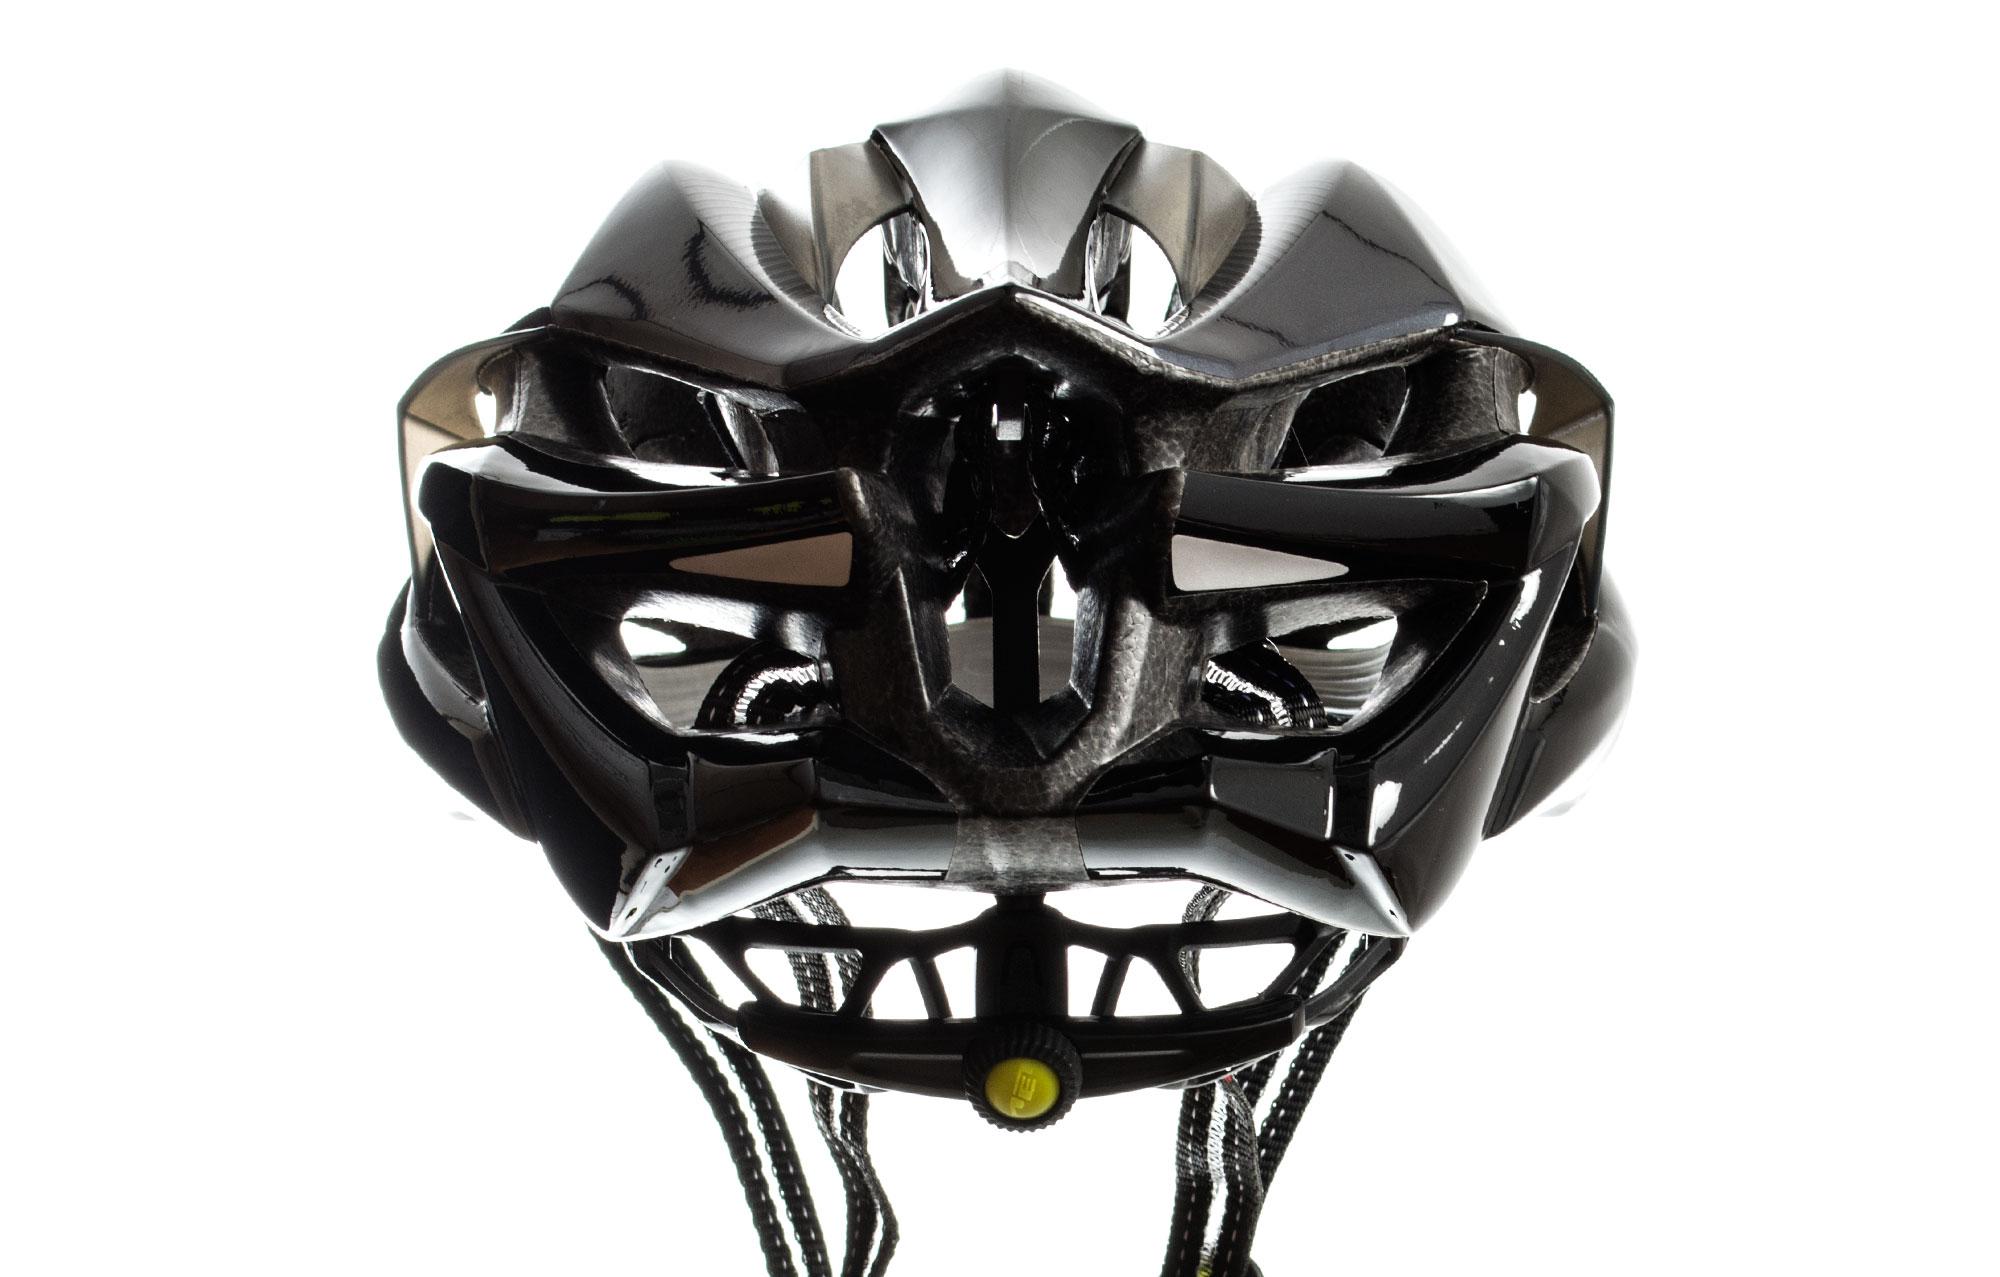 met sine thesis reviews Met's sine thesis bike helmet has innovative features and great ventilation, says  220 reviewer mike anderson.